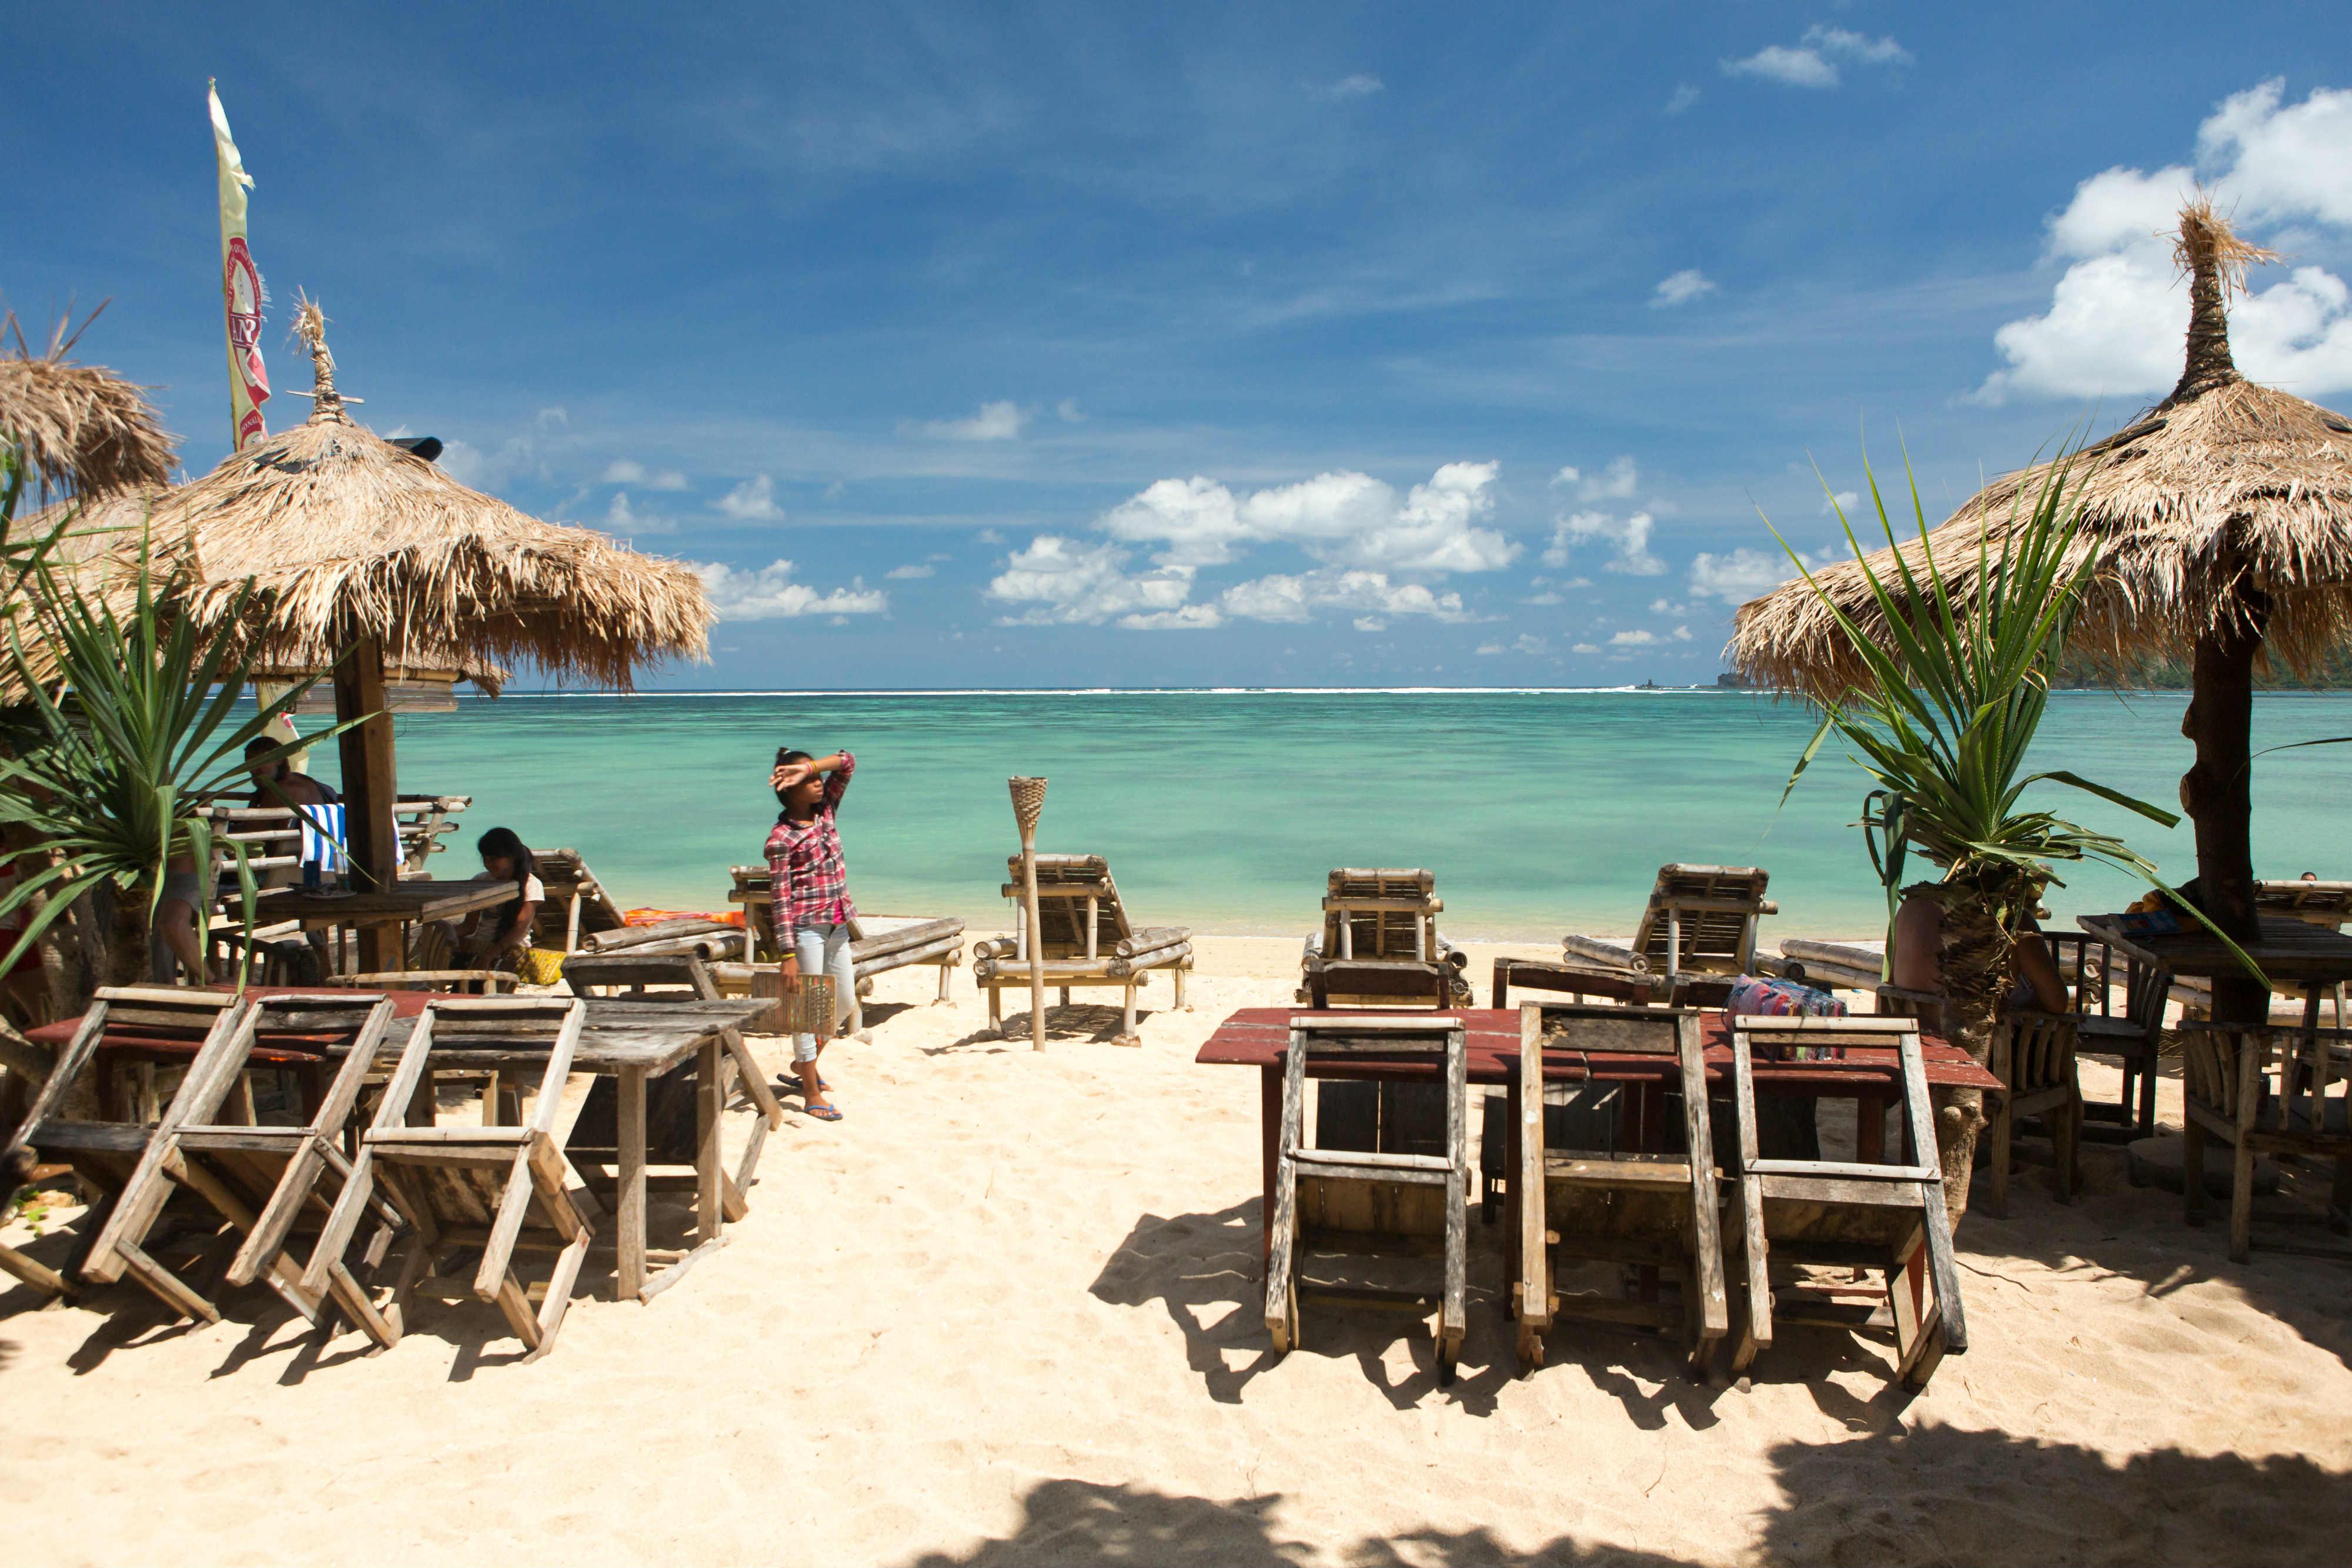 séjour noël original - Bali